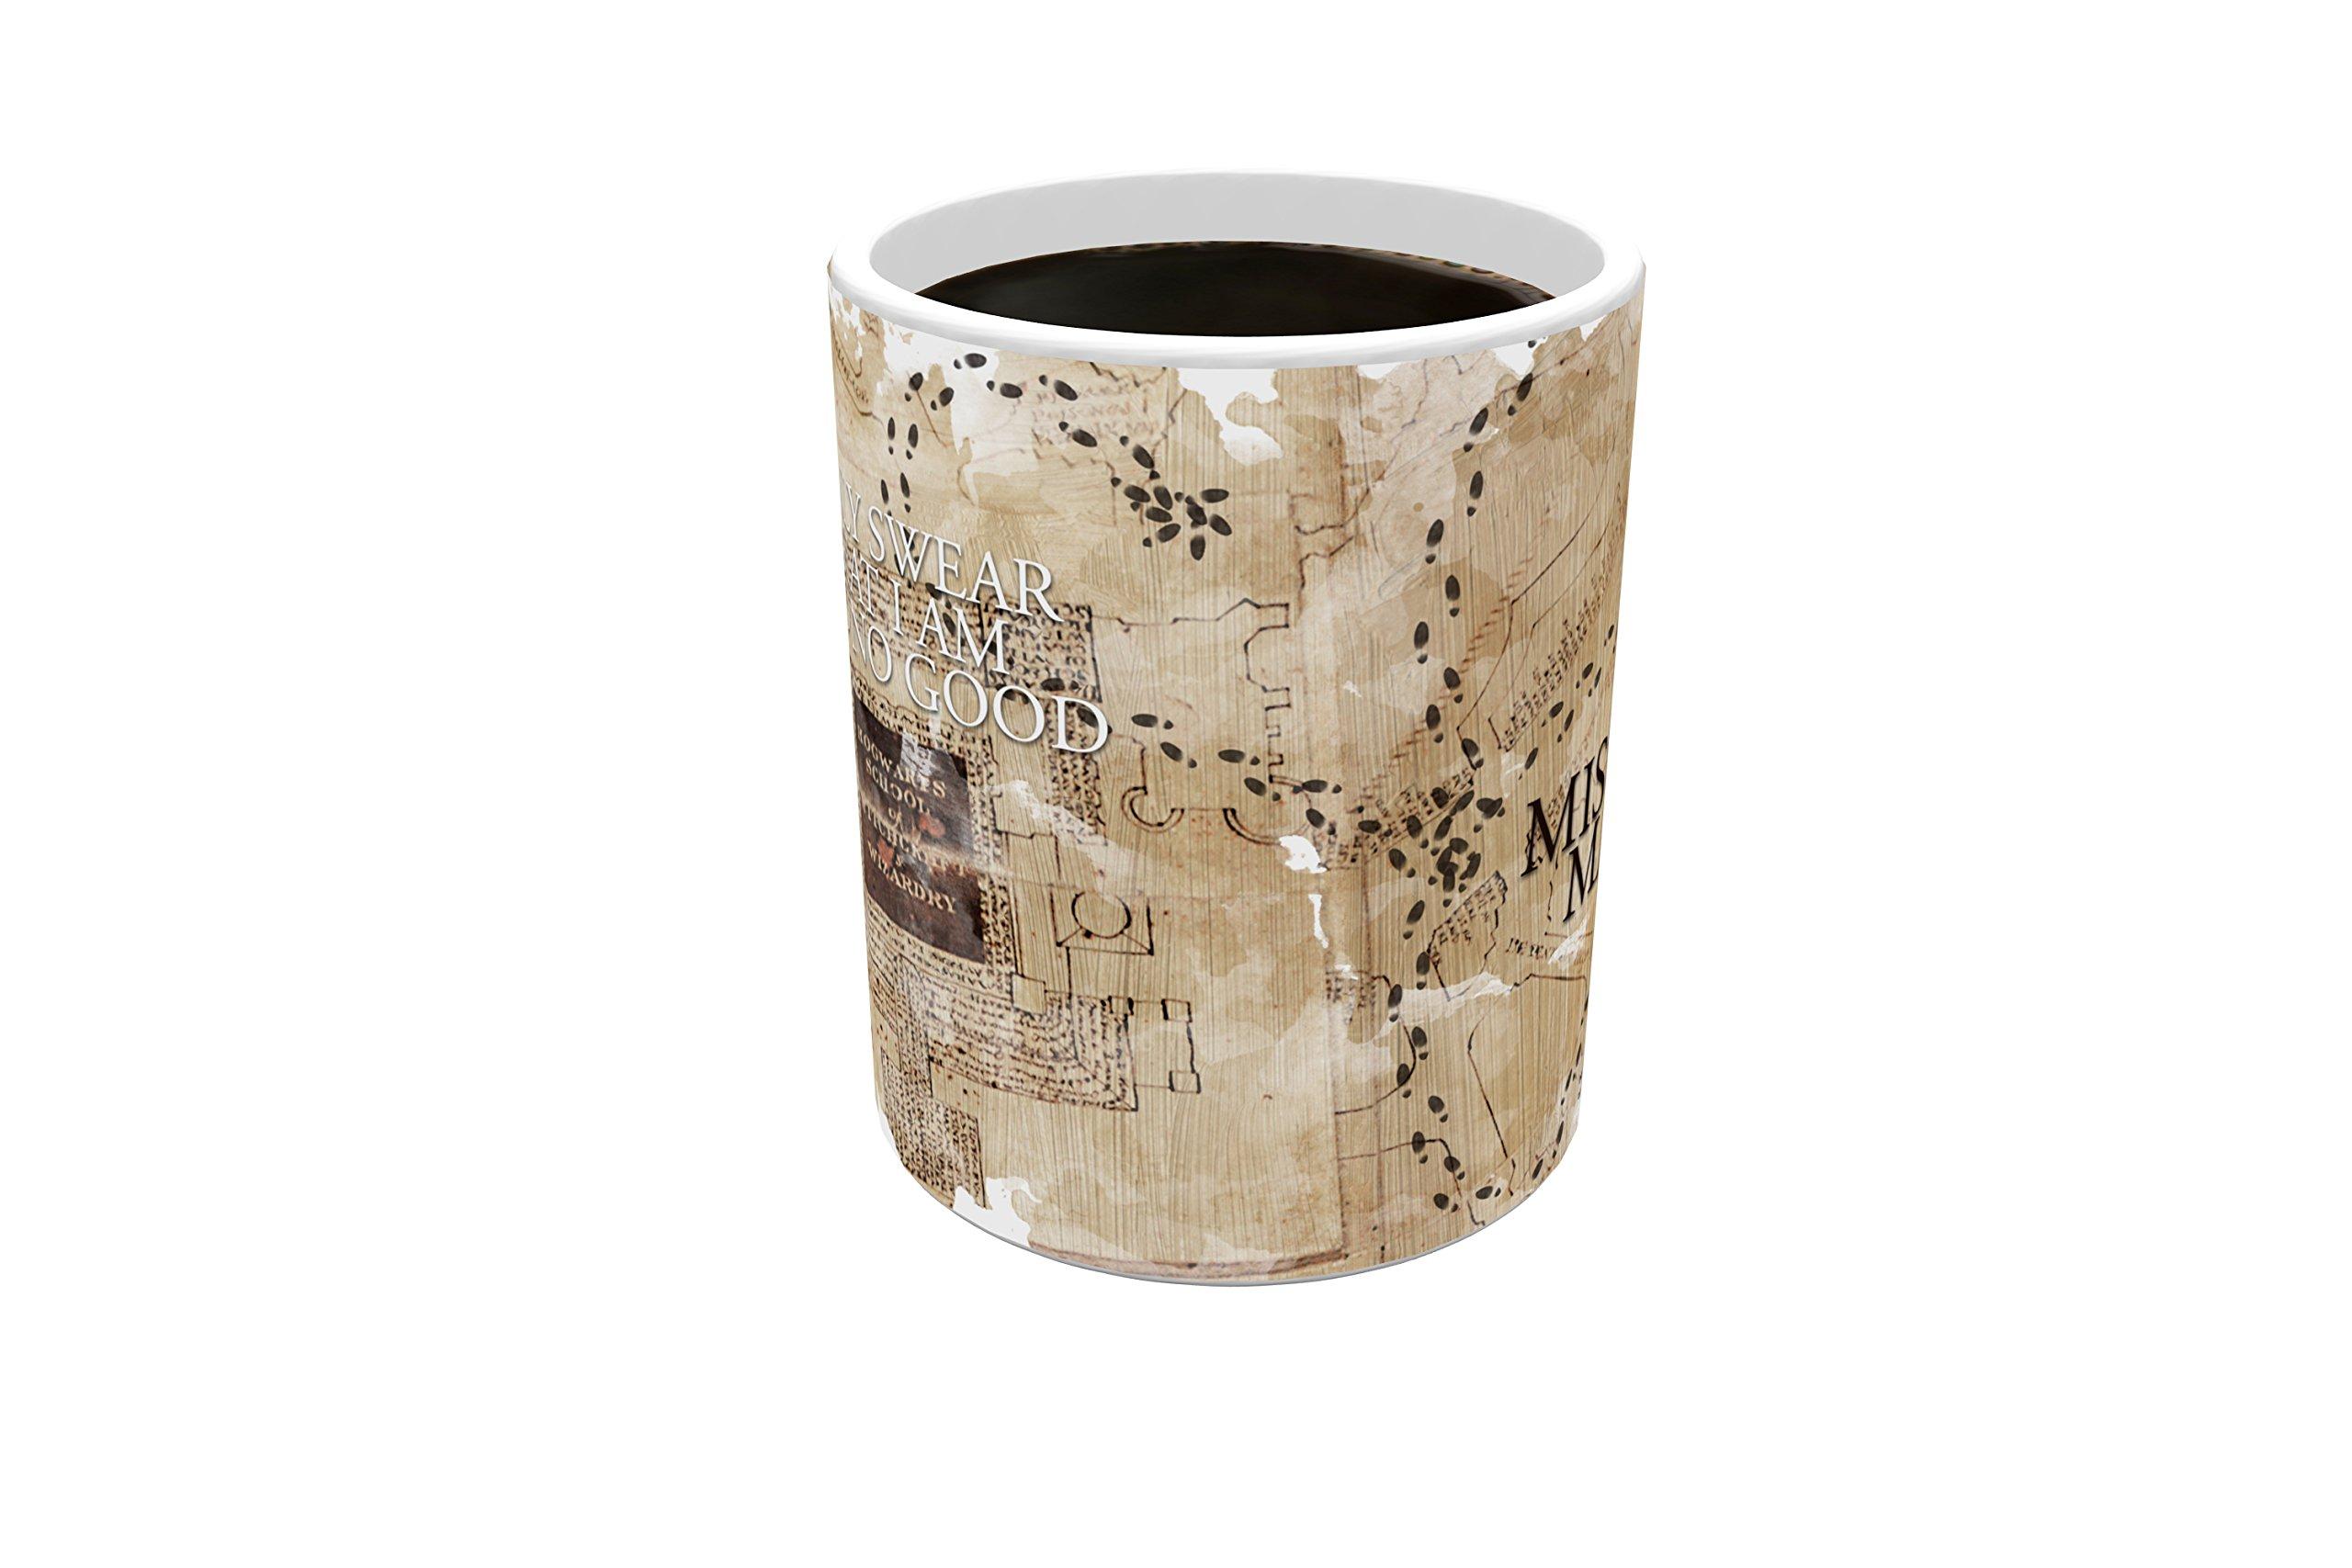 Morphing Mugs Harry Potter Hogwarts Marauders Map Heat Reveal Ceramic Coffee Mug - 11 Ounces by Morphing Mugs (Image #4)